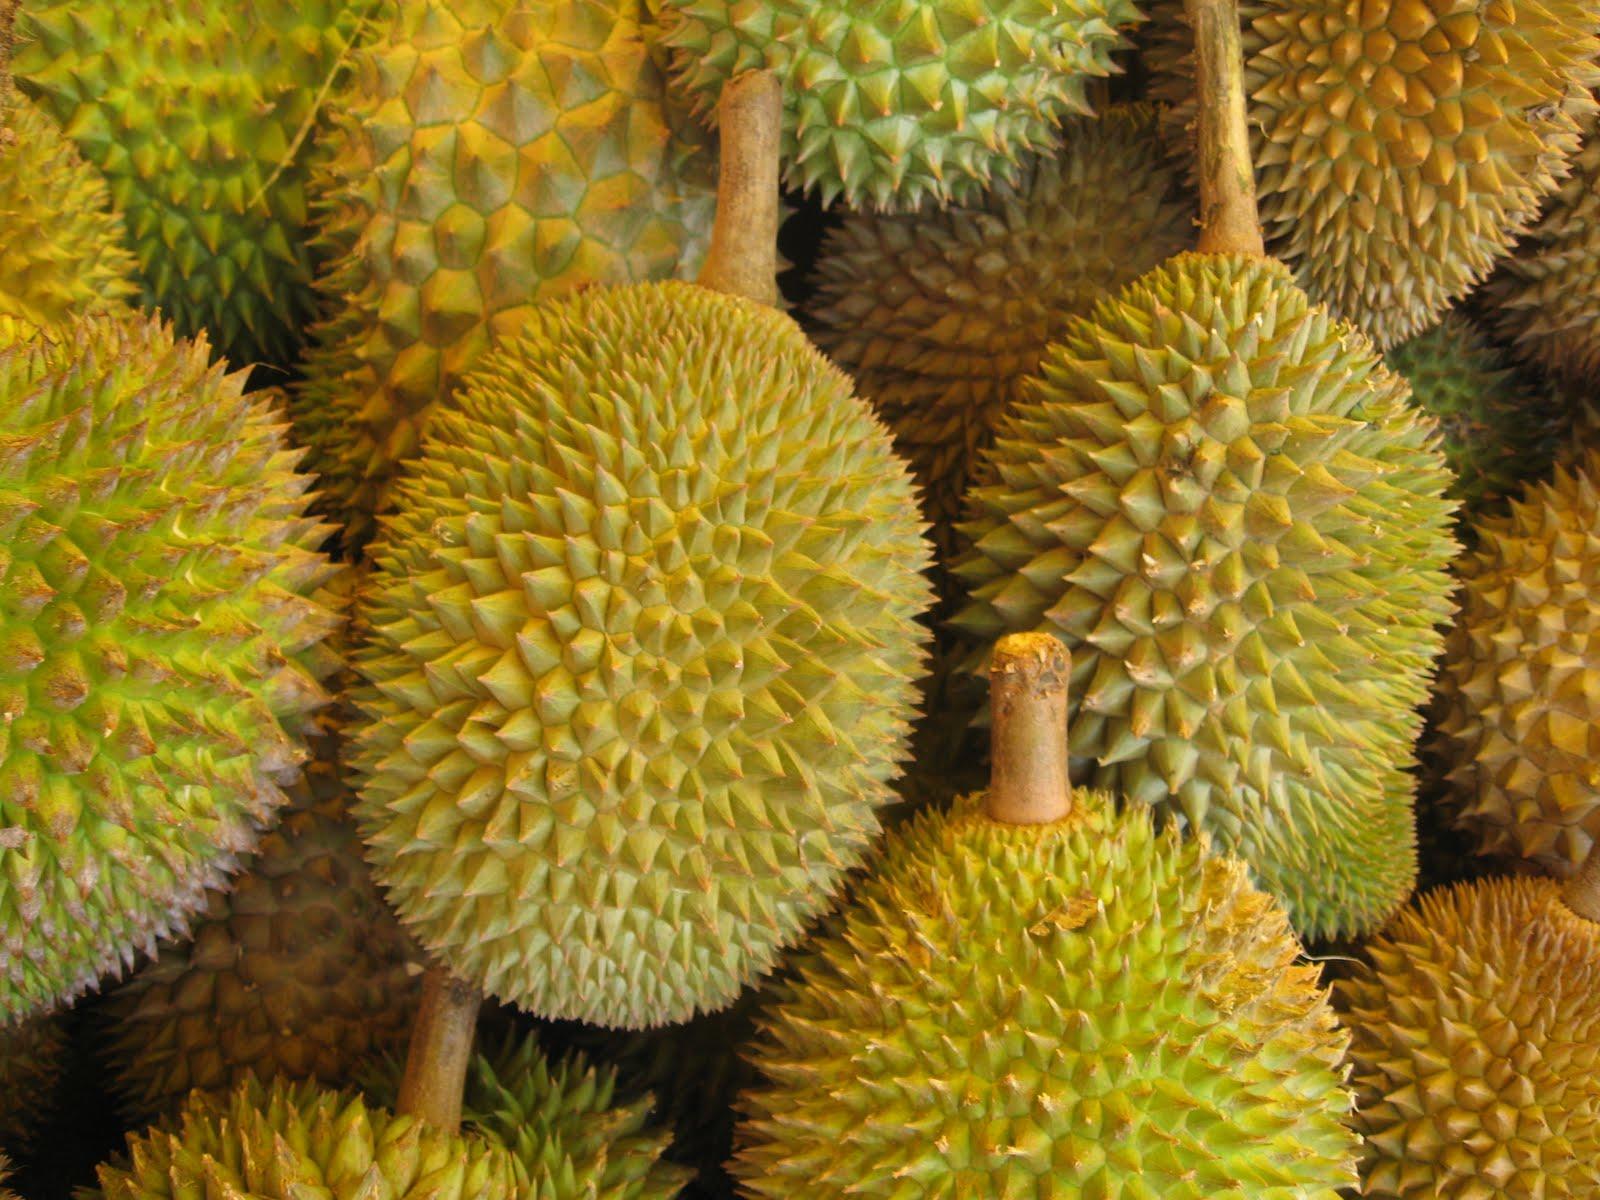 ongzi 39 s secretgarden durian. Black Bedroom Furniture Sets. Home Design Ideas